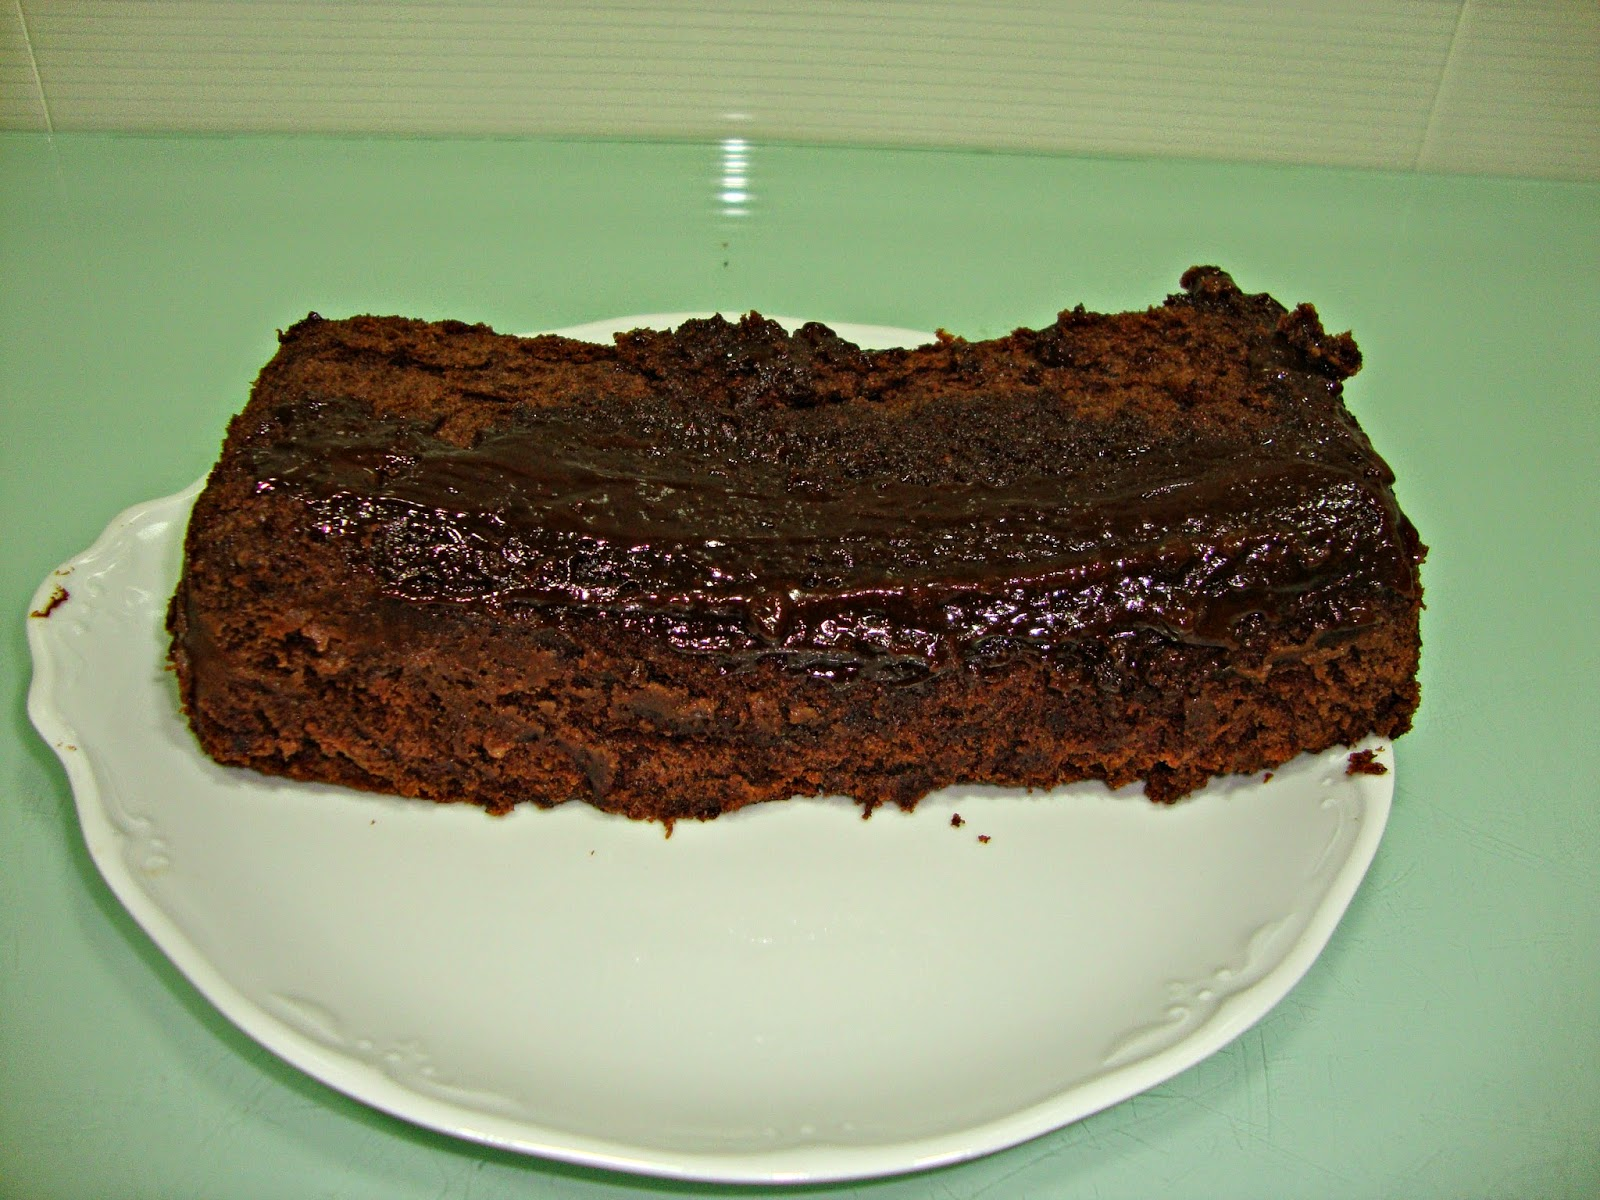 The muffin mum bizcocho en microondas - Bizcocho microondas 3 minutos ...